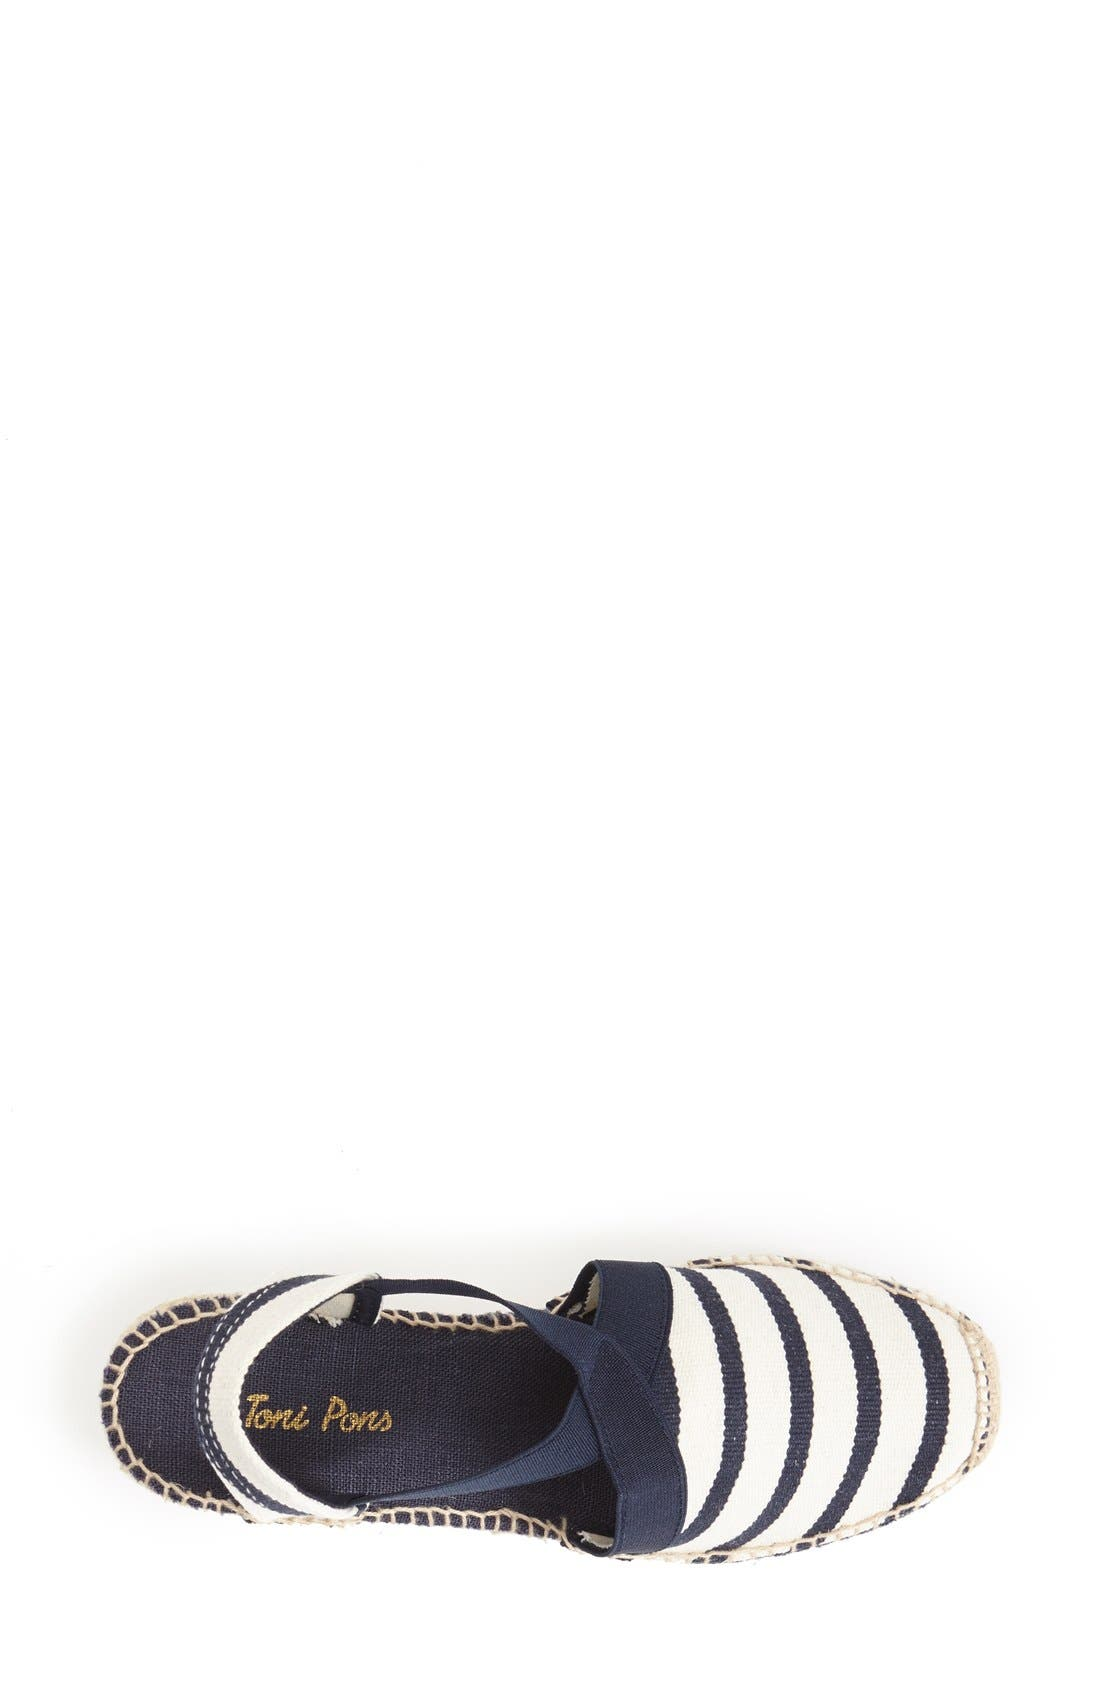 'Tarbes' Espadrille Wedge Sandal,                             Alternate thumbnail 4, color,                             BLUE